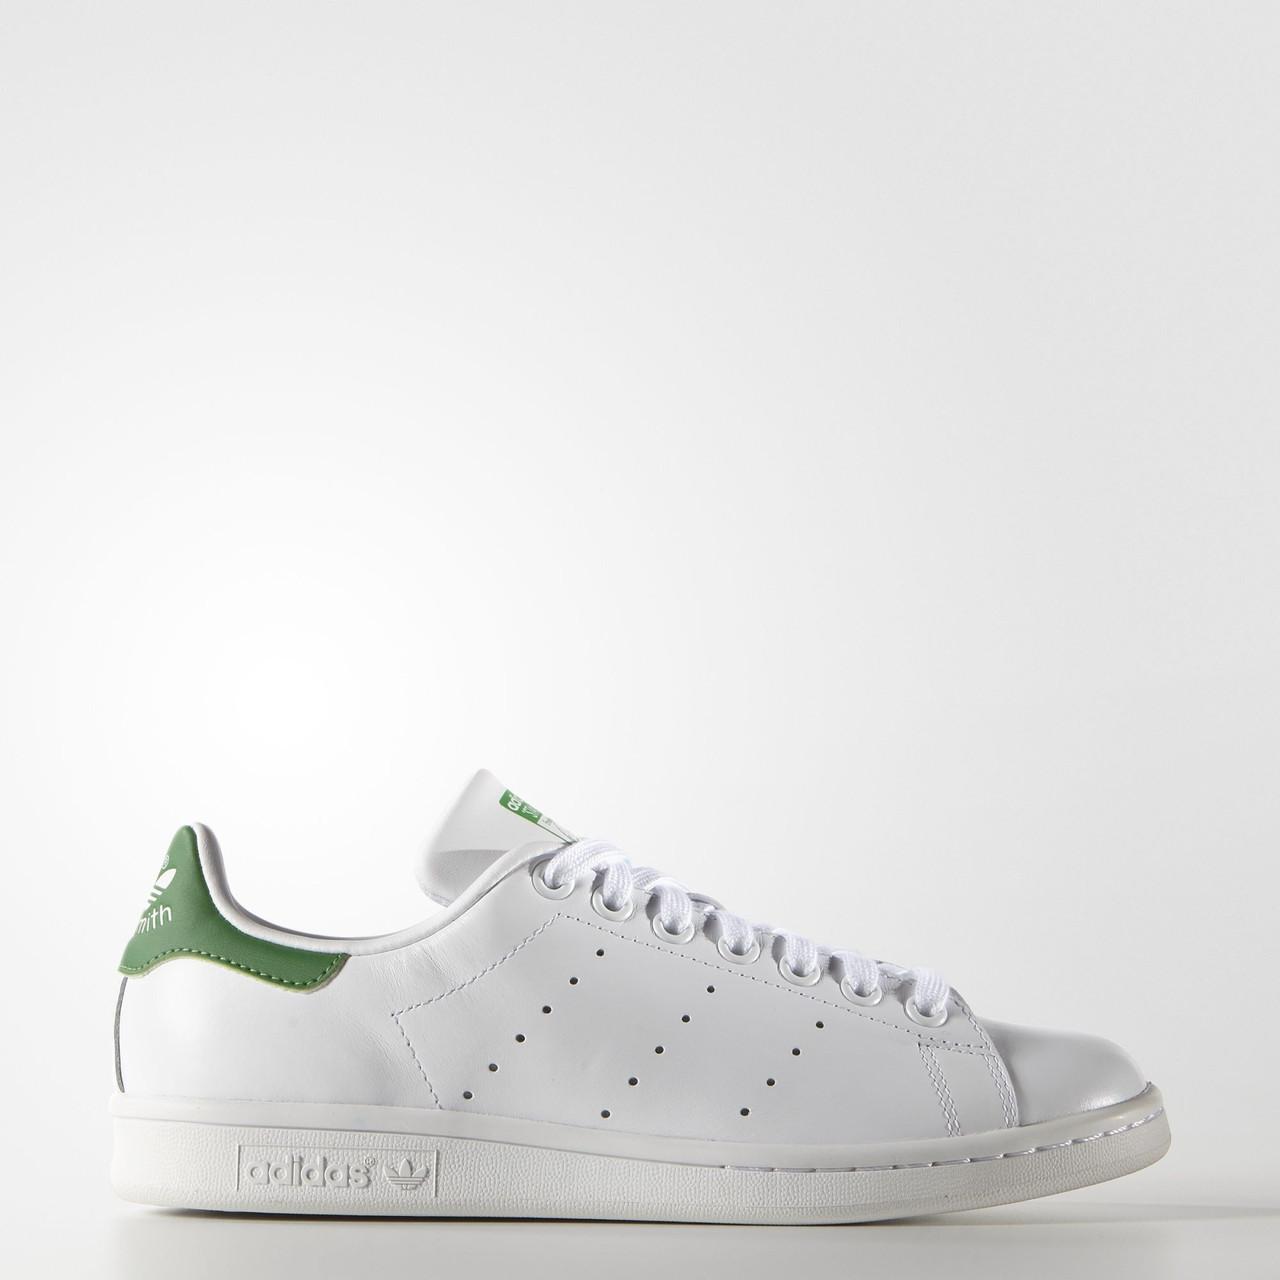 Женские кроссовки Adidas Originals Stan Smith (Артикул: B24105)